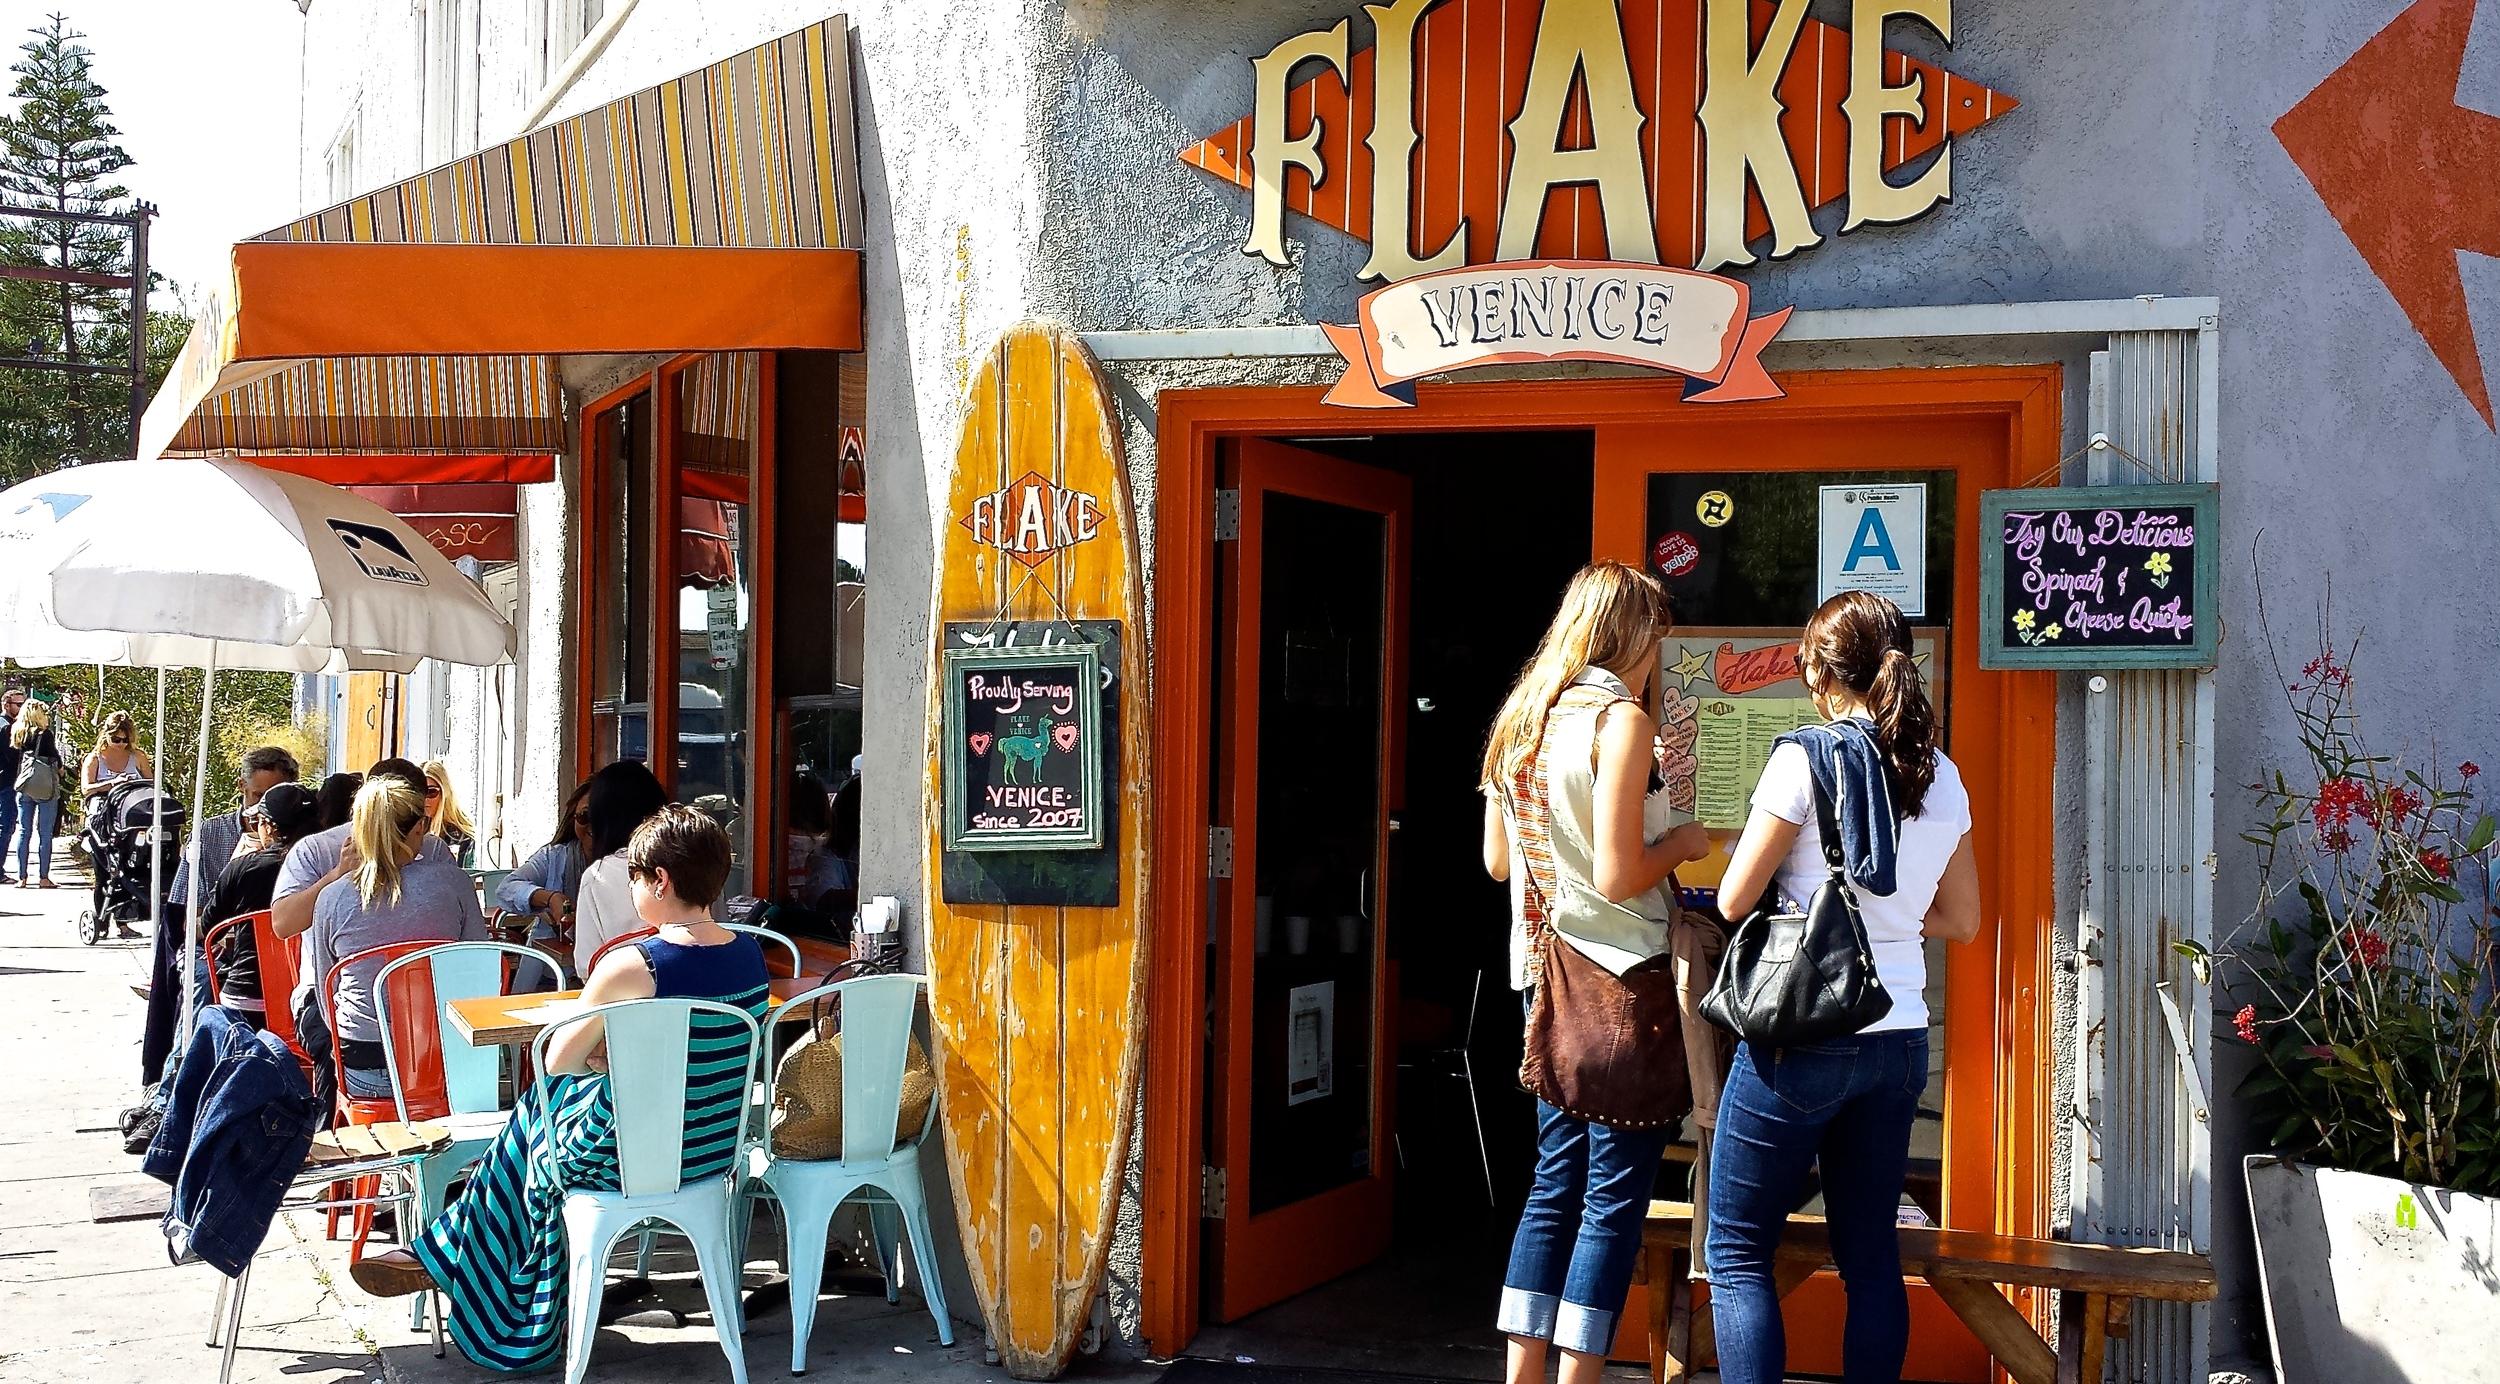 Flake Rose Avenue Venice